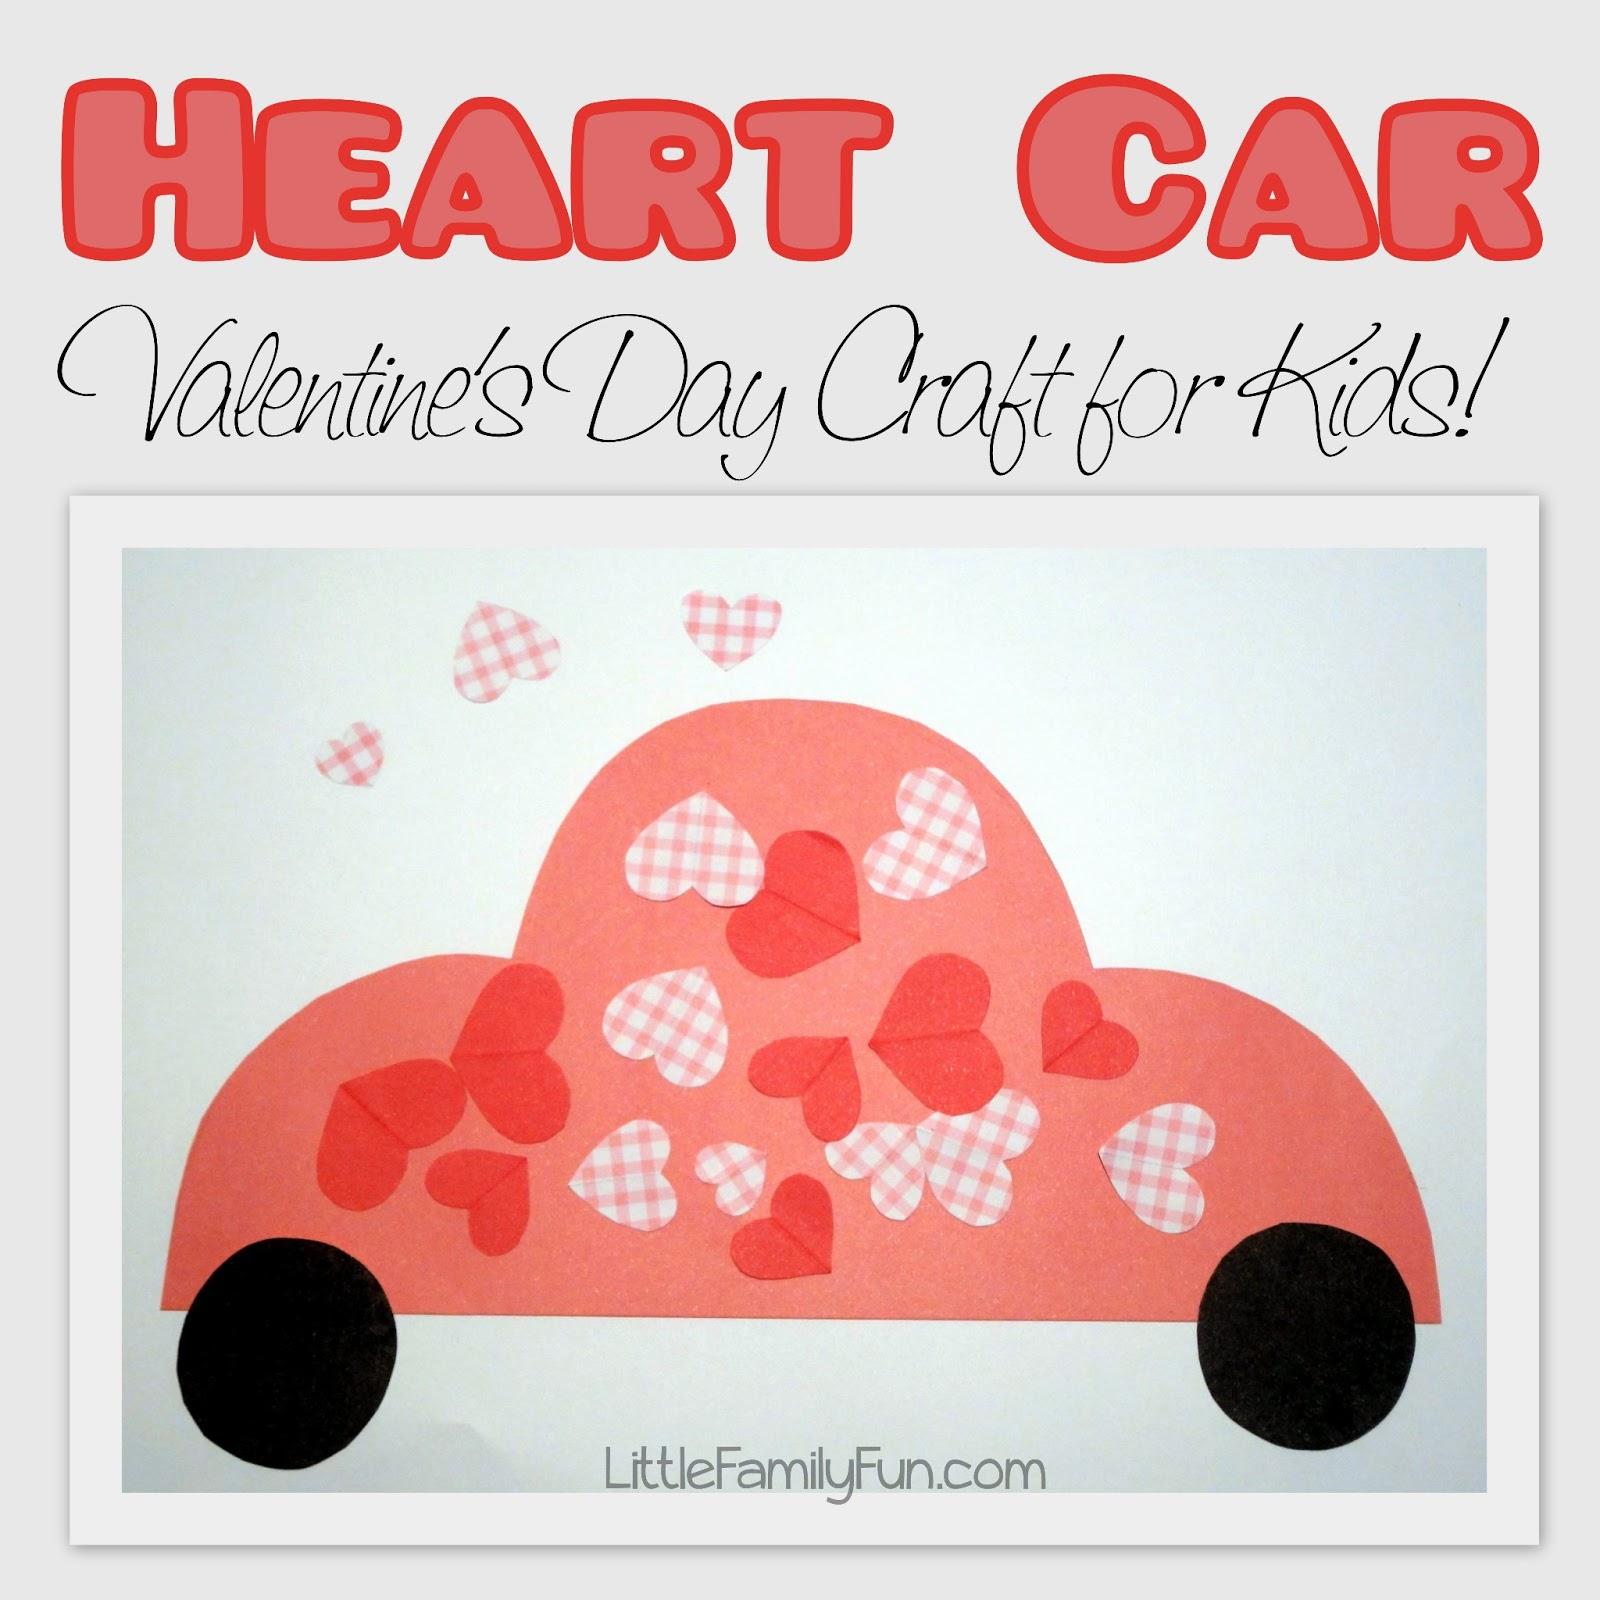 Valentines day crafts for children - Valentine S Day Crafts Activities For Kids